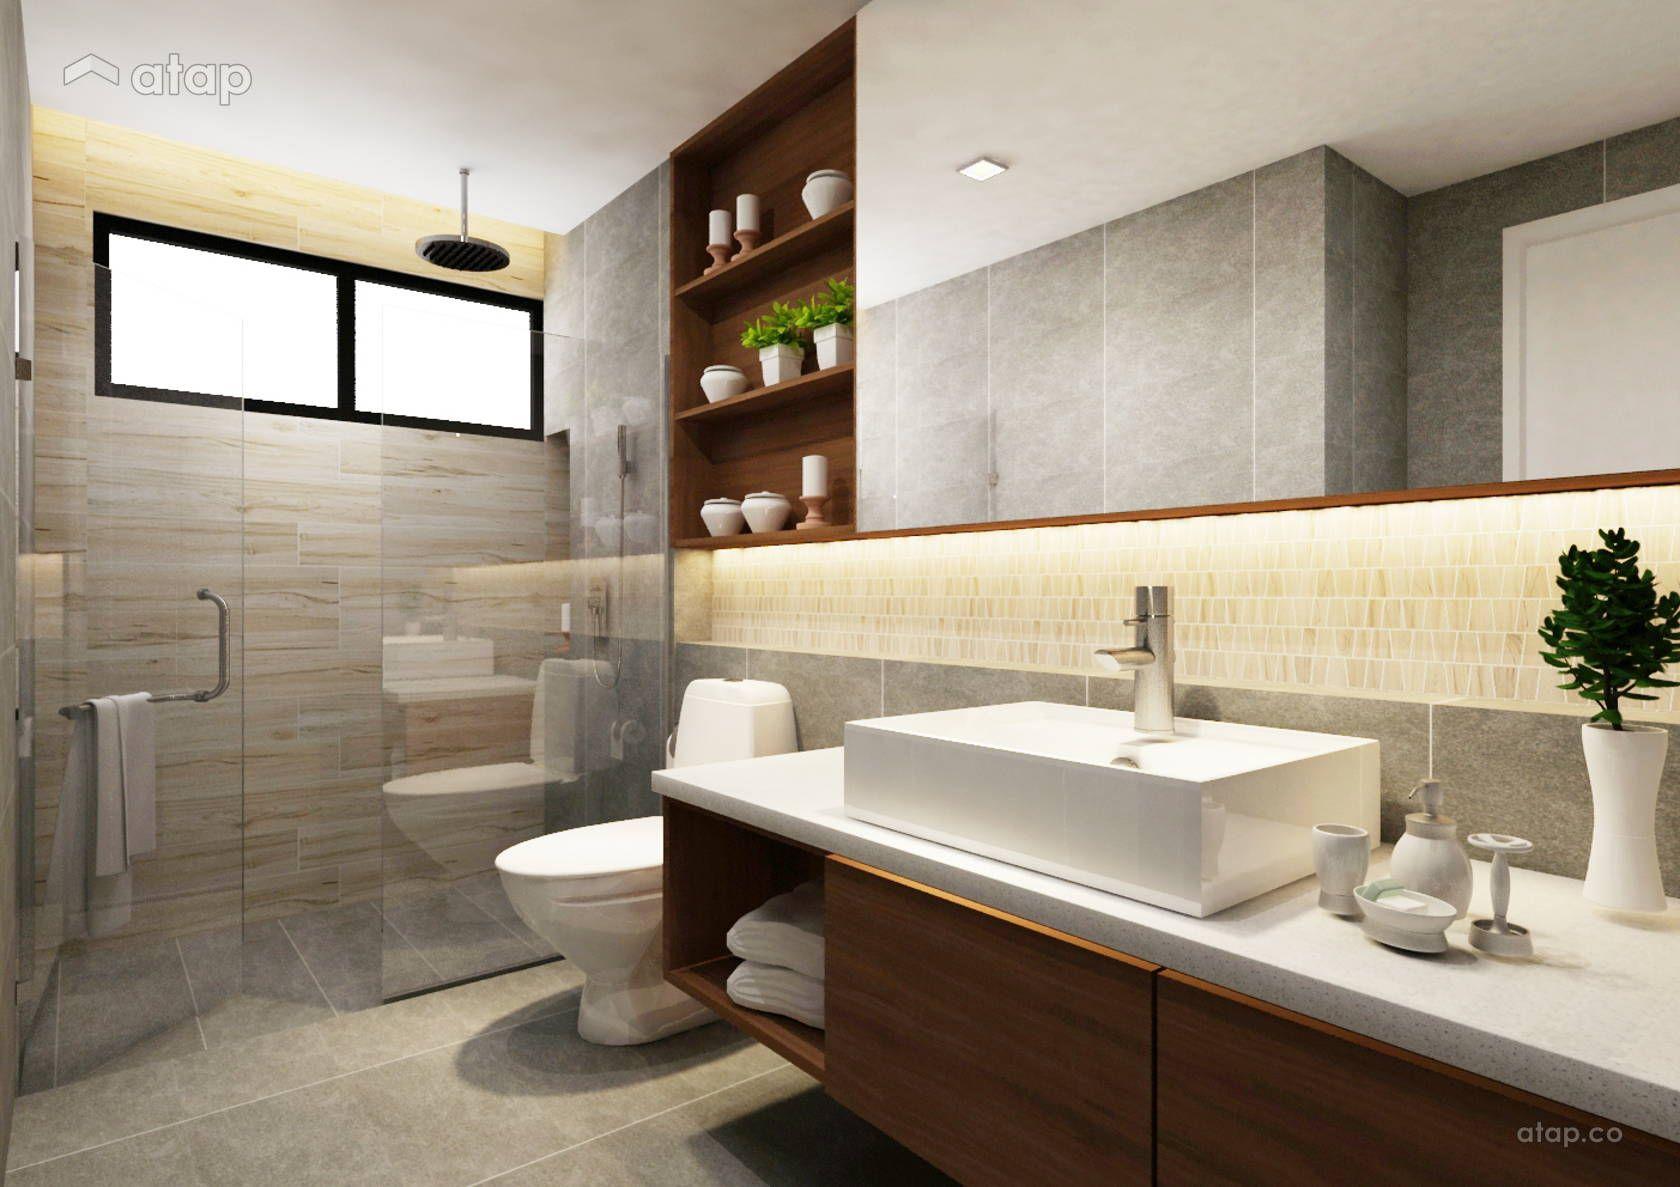 Contemporary Modern Bathroom Semi Detached Design Ideas Photos Malaysia Atap Co Modern Bathroom Design Bathroom